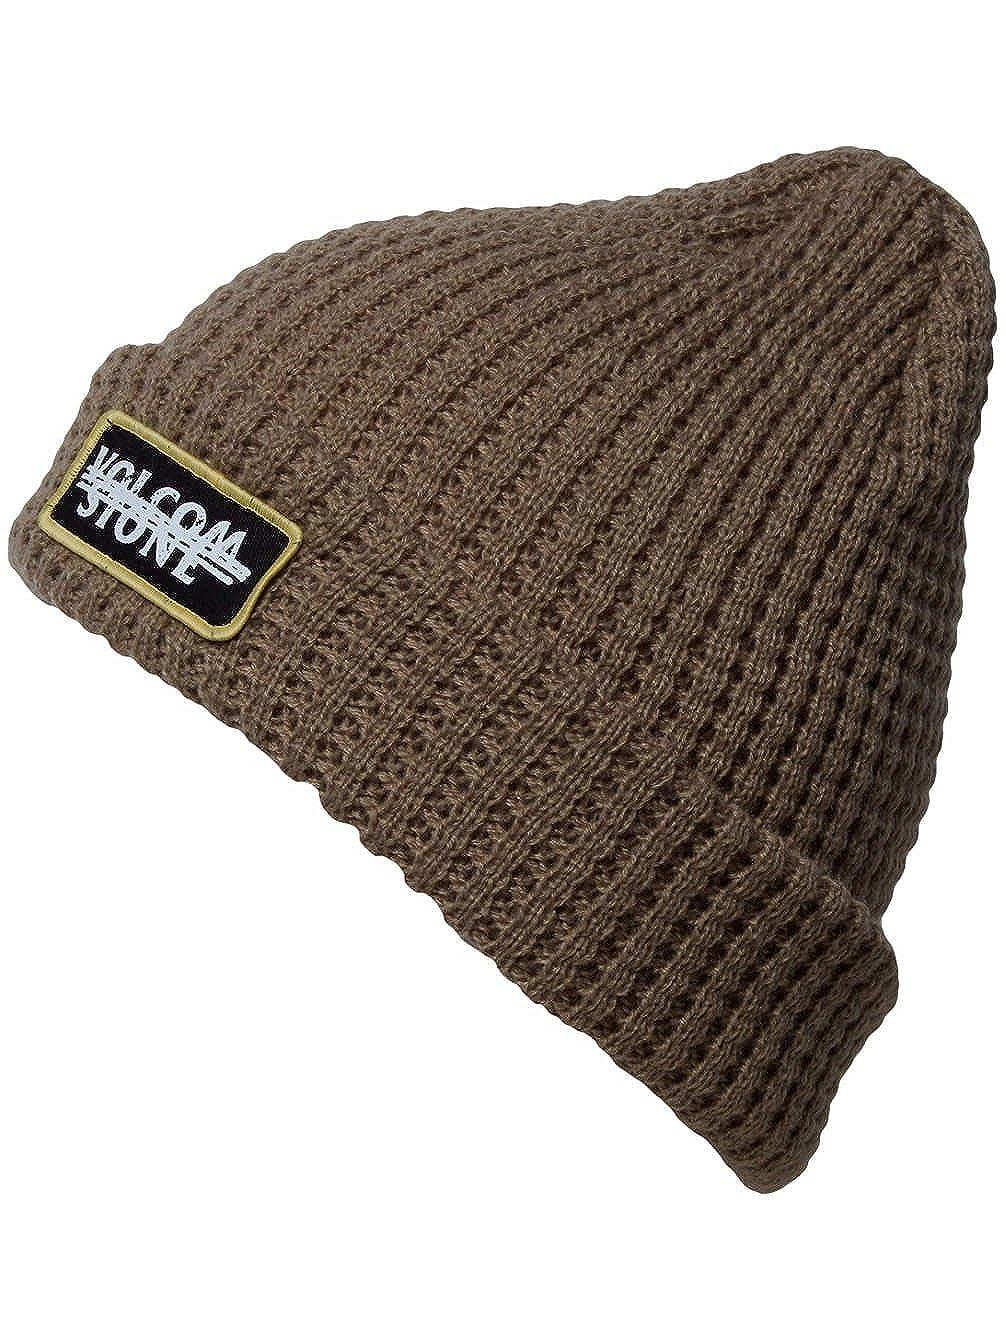 Volcom Men s Scribble Stone Beanie Hat 777d994b41d